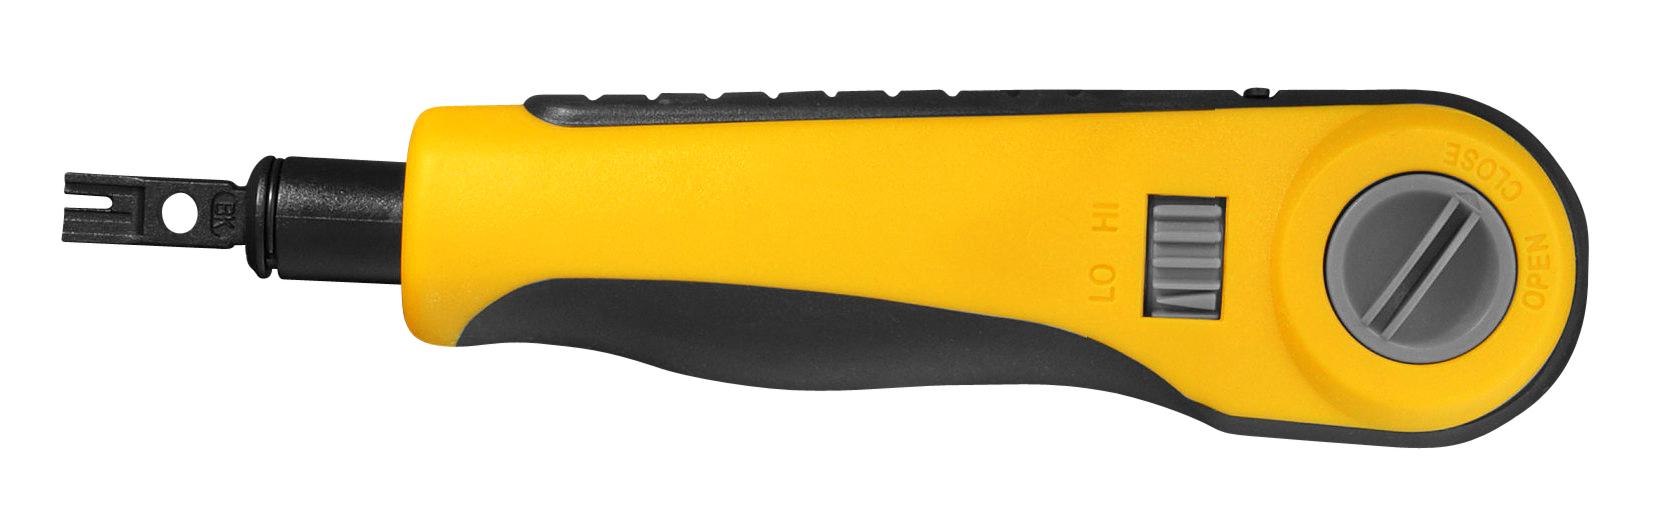 1 Stk LSA Auflegewerkzeug ohne Sensor HSETOOL01F